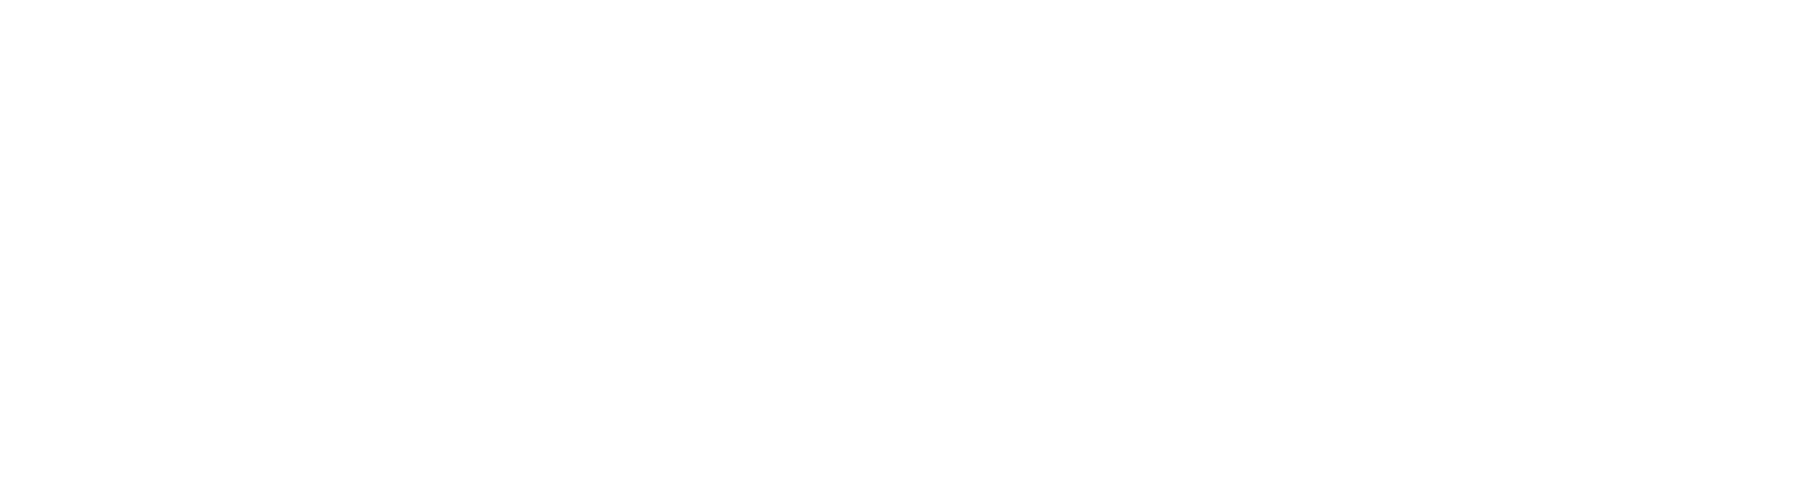 Design og logoer cover image